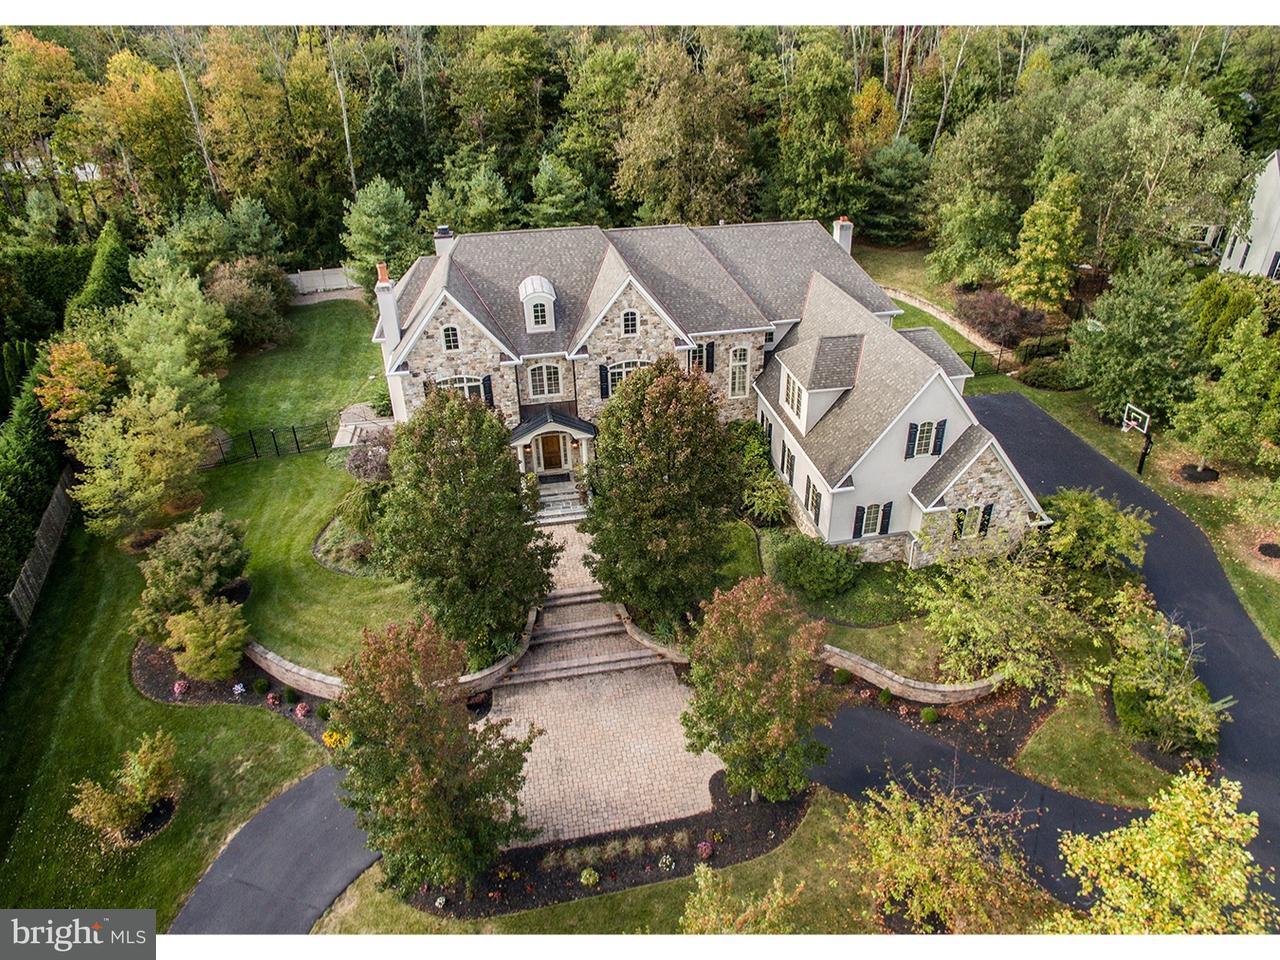 Single Family Home for Sale at 861 S PENN OAK Road Lower Gwynedd, Pennsylvania 19002 United States